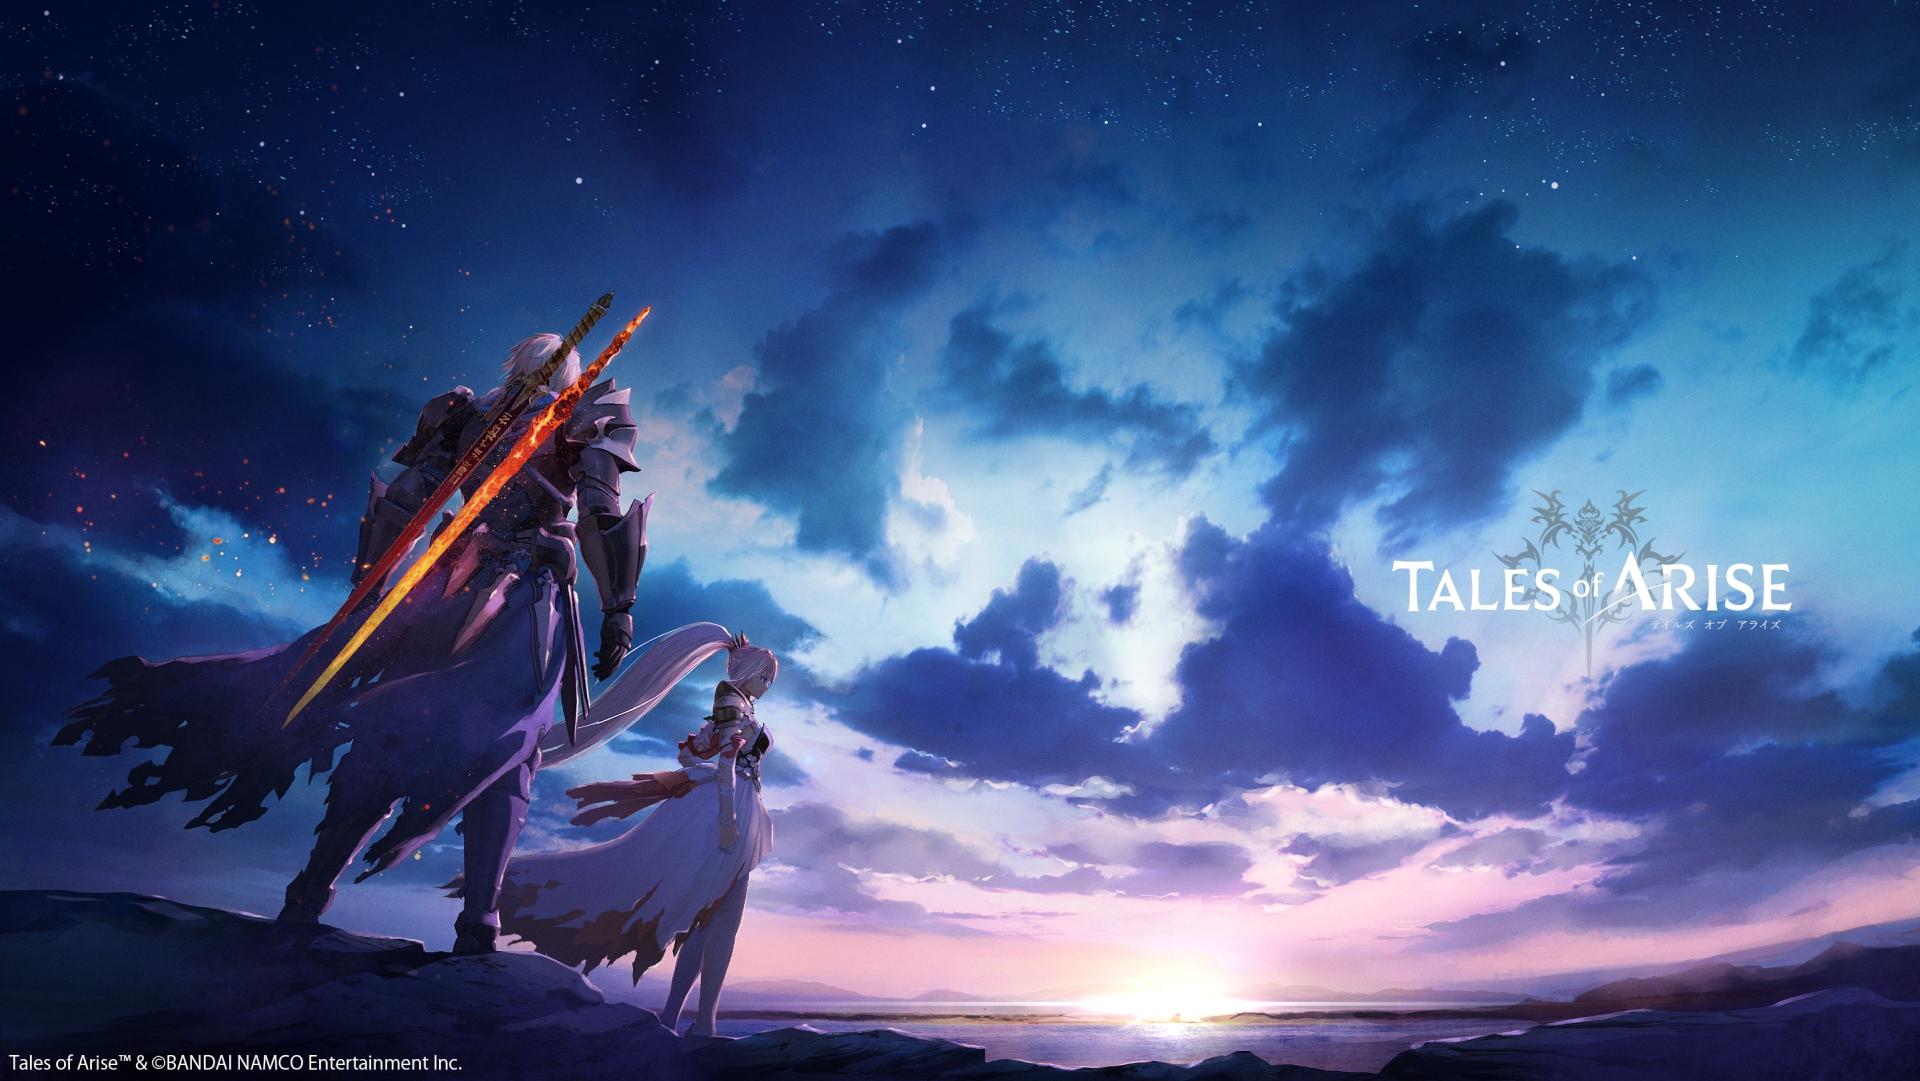 TGS 2020 pouze online a Fairy Tail v druhém traileru Tales of Arise 2020 06 25 20 001